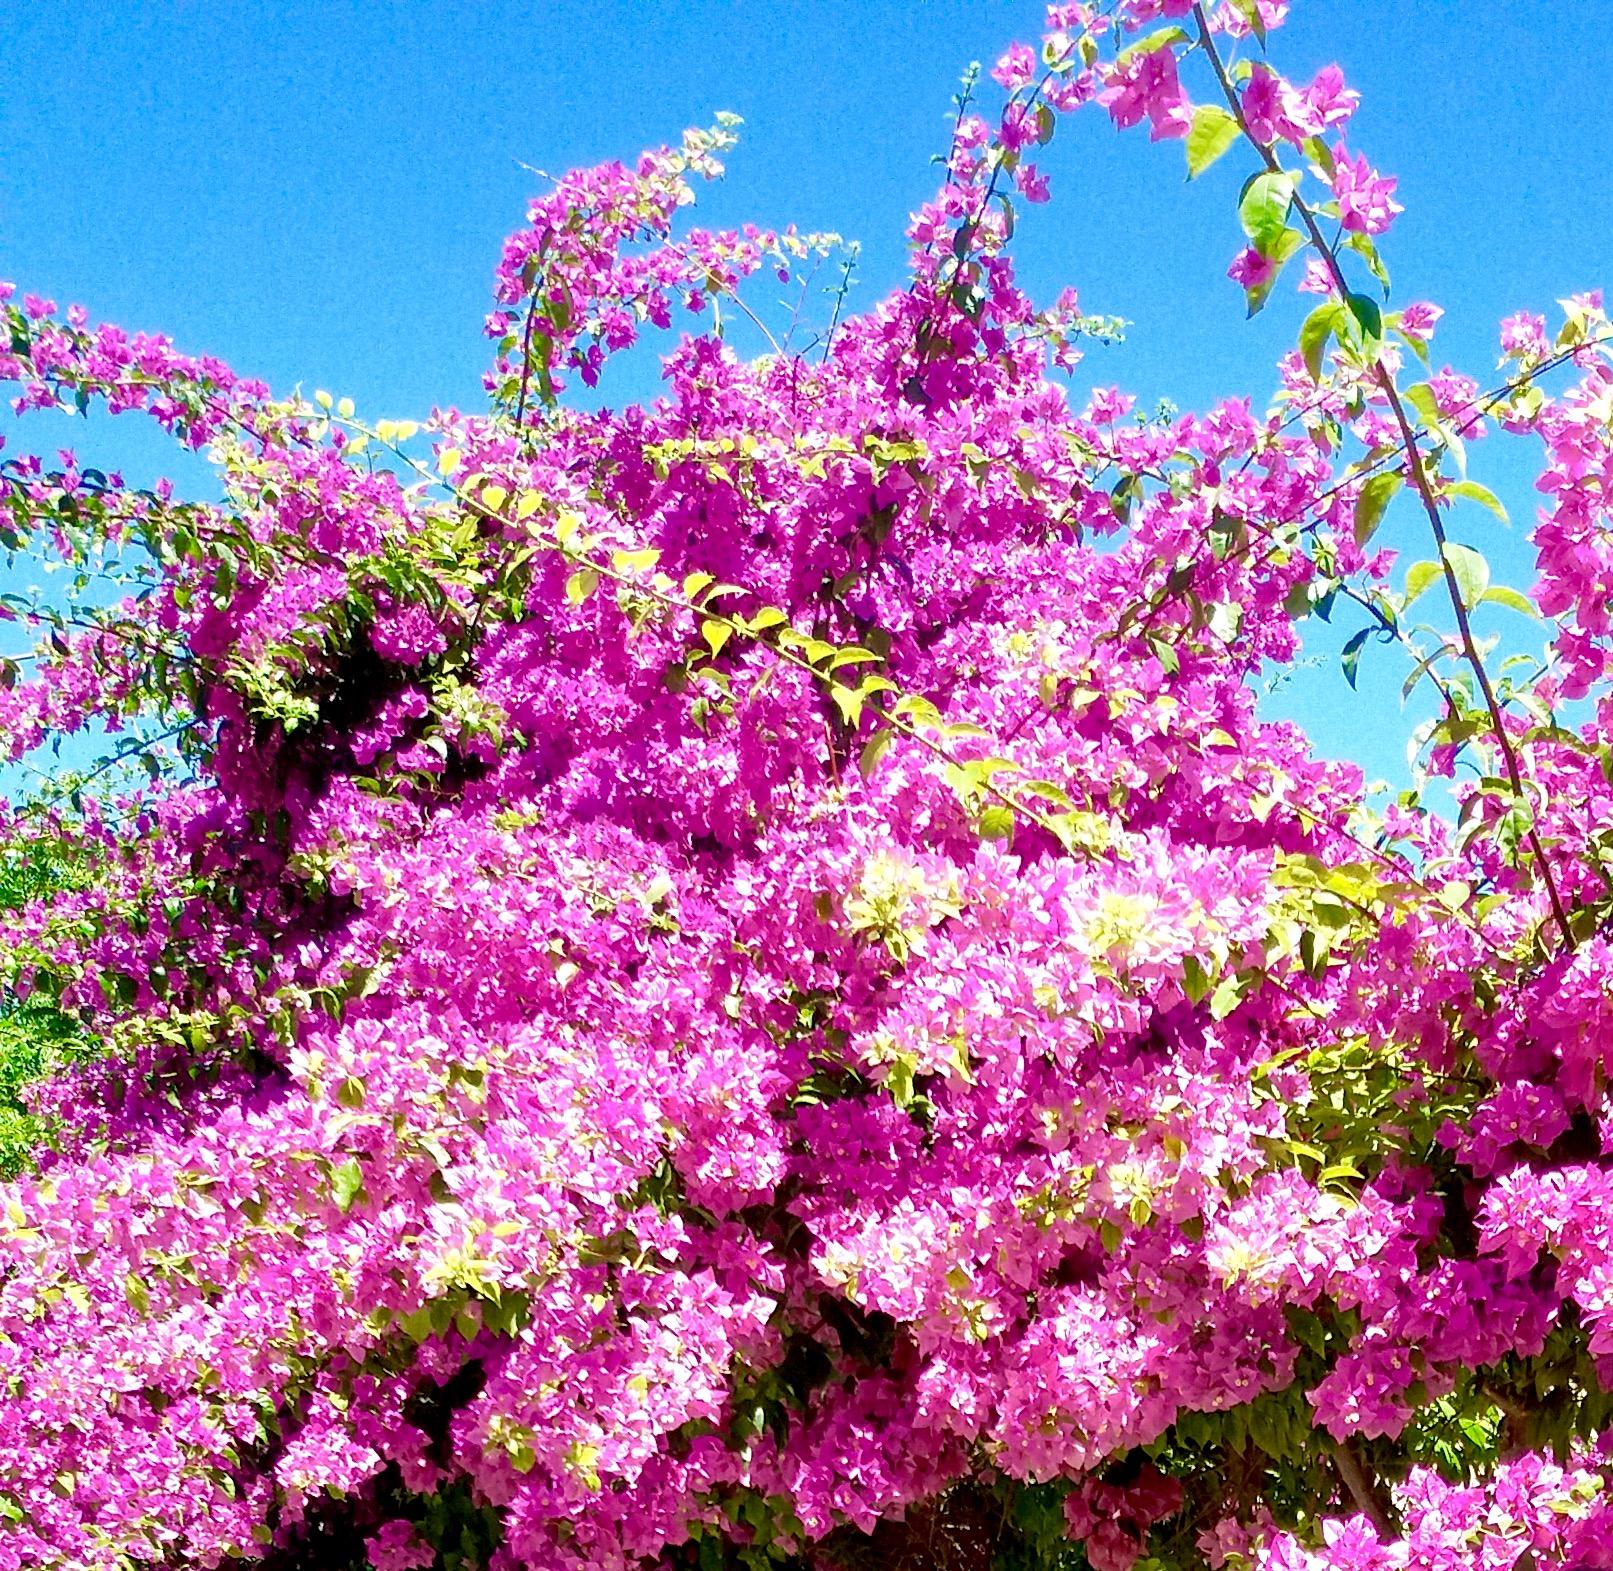 Filemediterranean flowerg wikimedia commons filemediterranean flowerg mightylinksfo